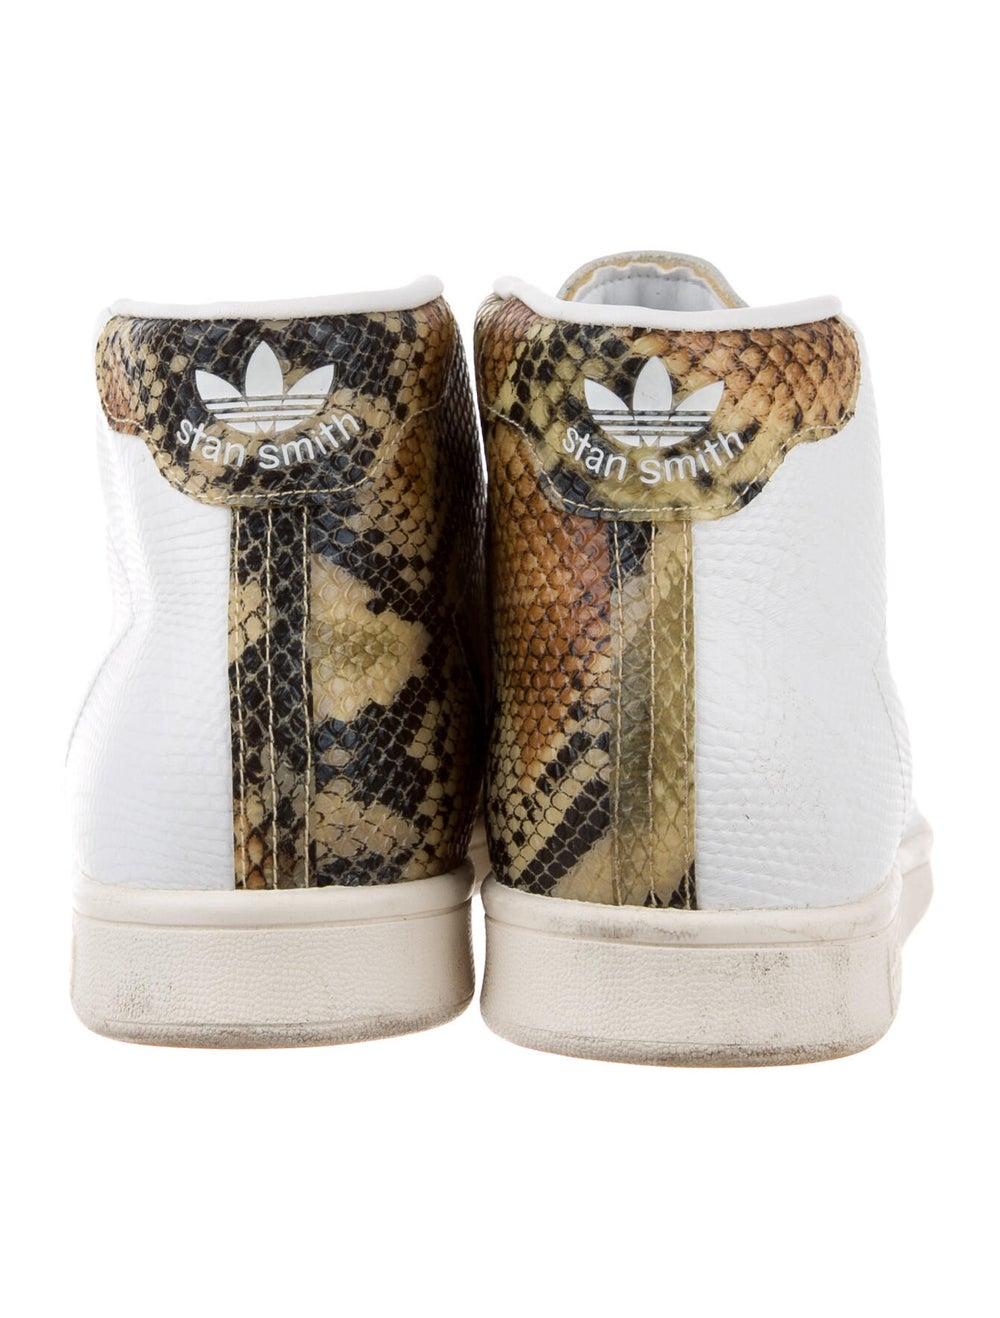 Adidas Stan Smith Mid Sneakers White - image 4